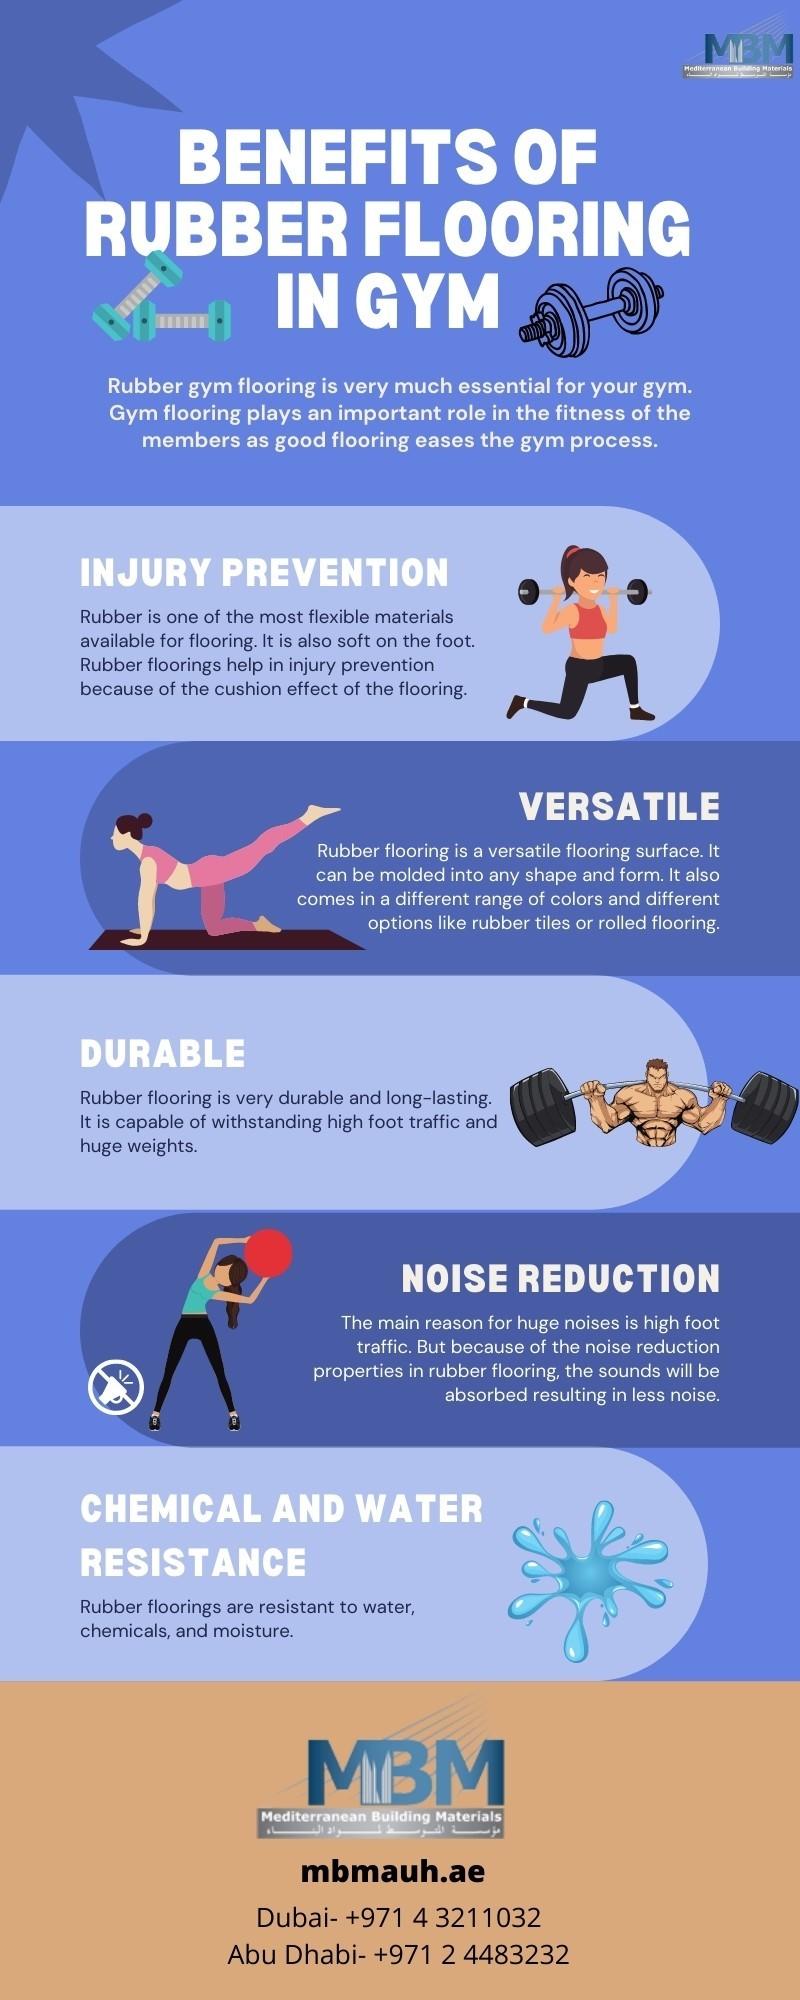 Gym Flooring Dubai, UAE- Benefits of rubber flooring in Gym | MBM